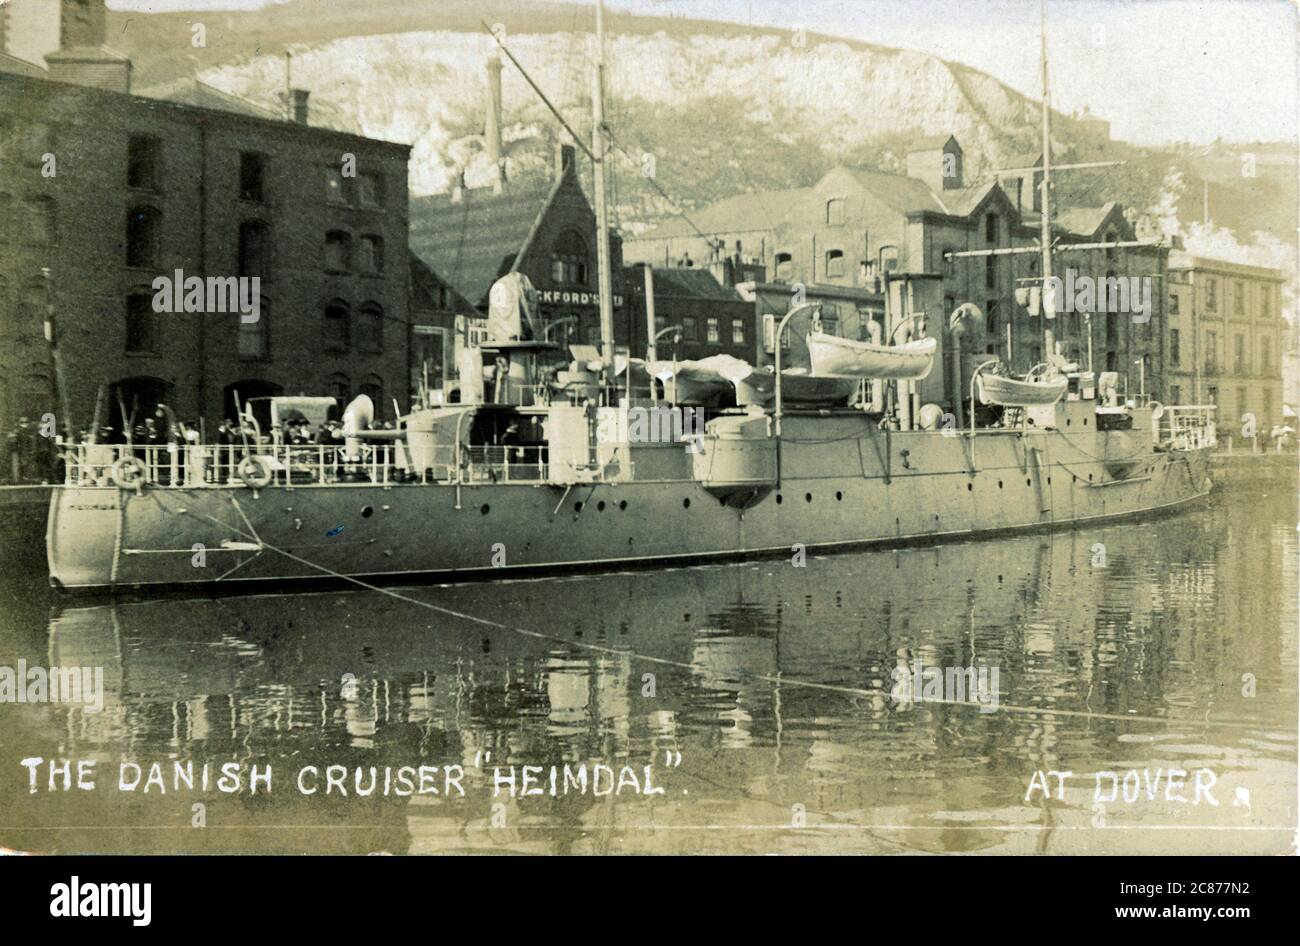 Le Danish Cruiser 'Heimdal', Douvres, Kent, Angleterre. Banque D'Images